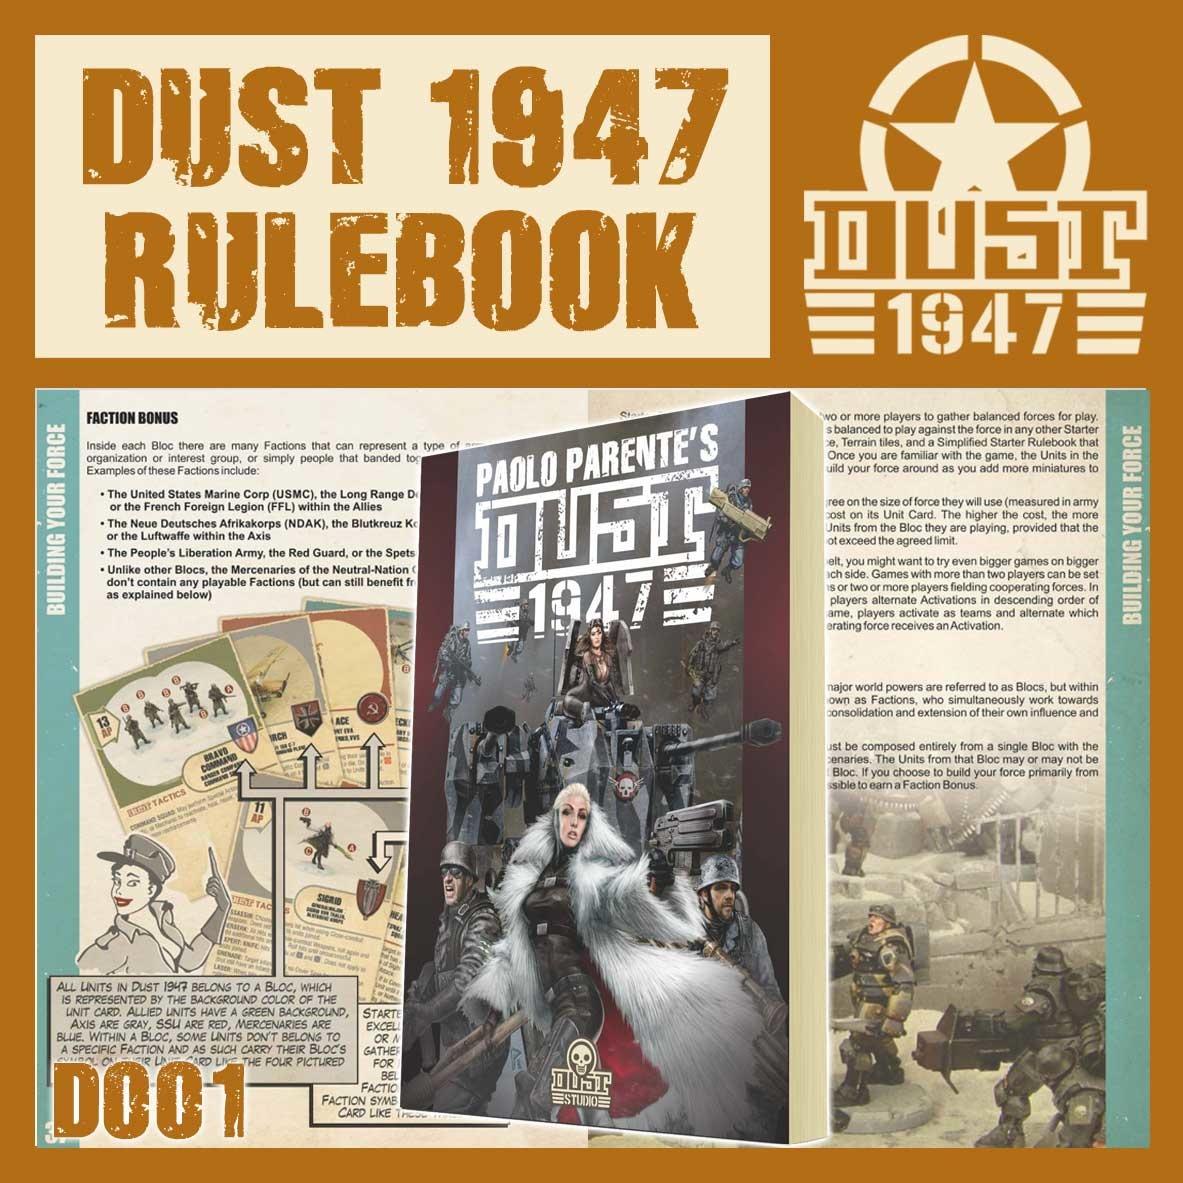 DUST USA DUST DROP-SHIP: Dust 1947 Rule Book